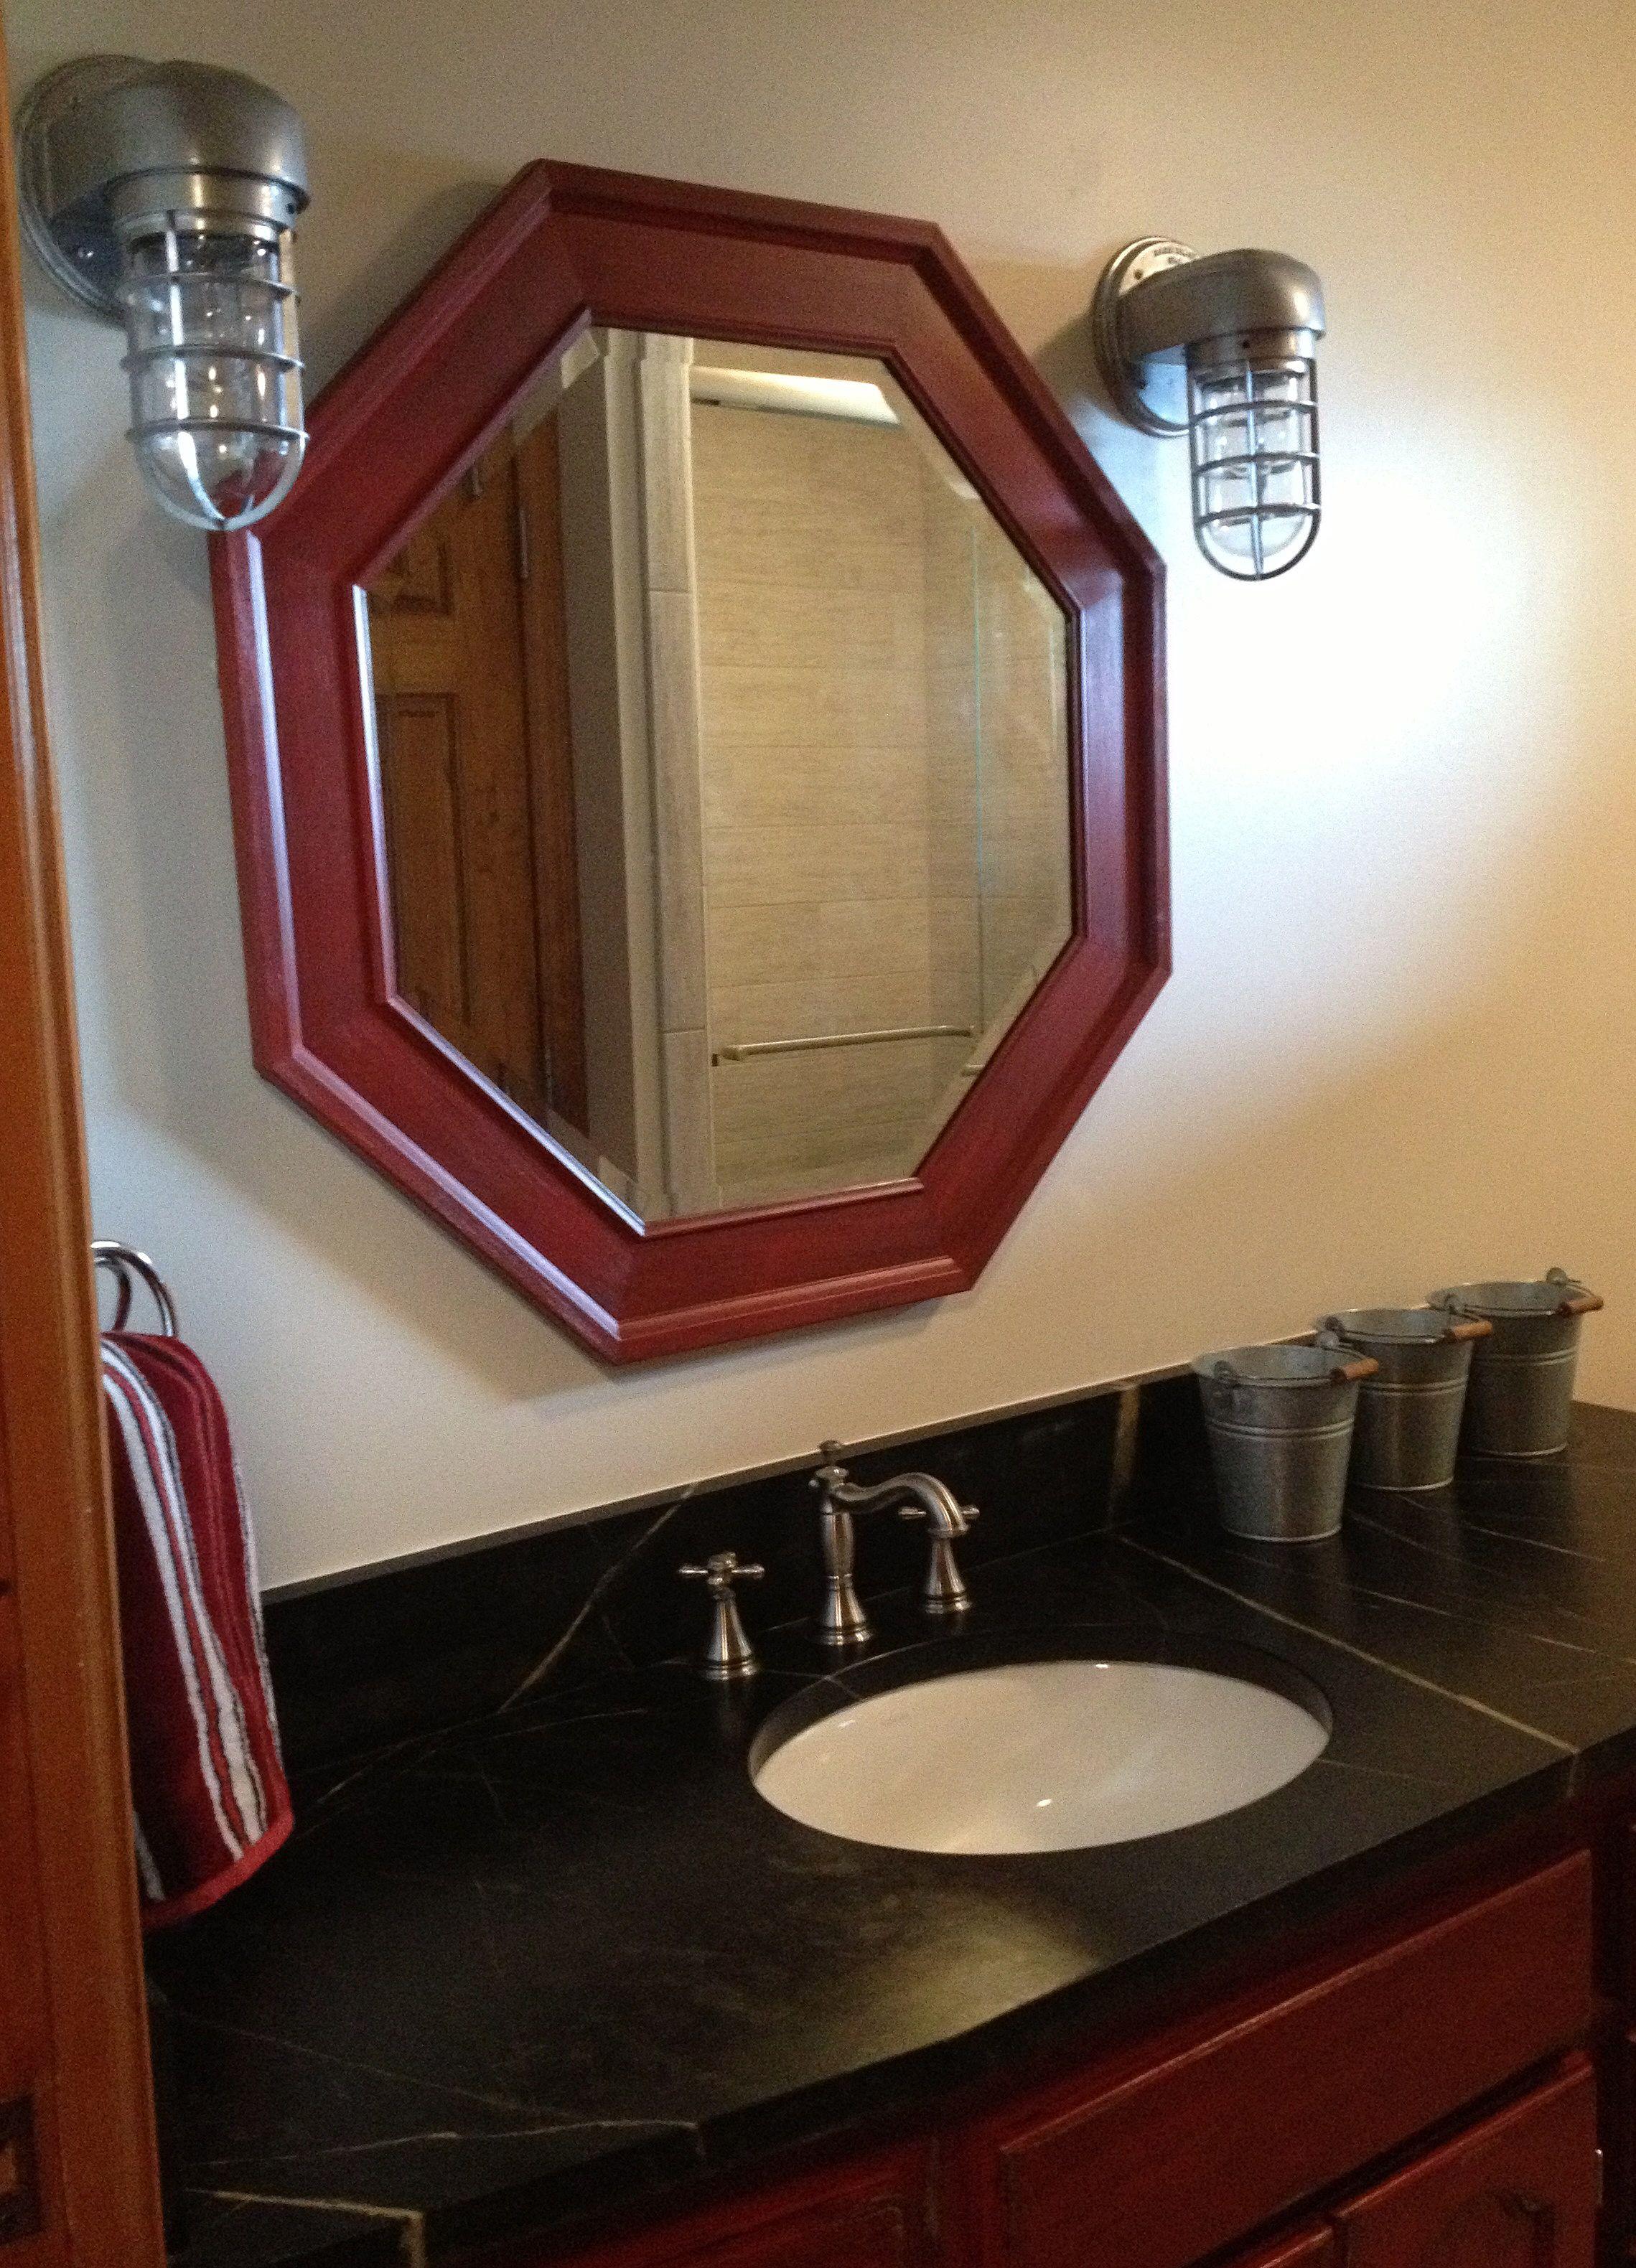 wall bubbly fullxfull black art nickel sconce century bathroom orb il vanity modern ul listed mid light industrial spherical listing